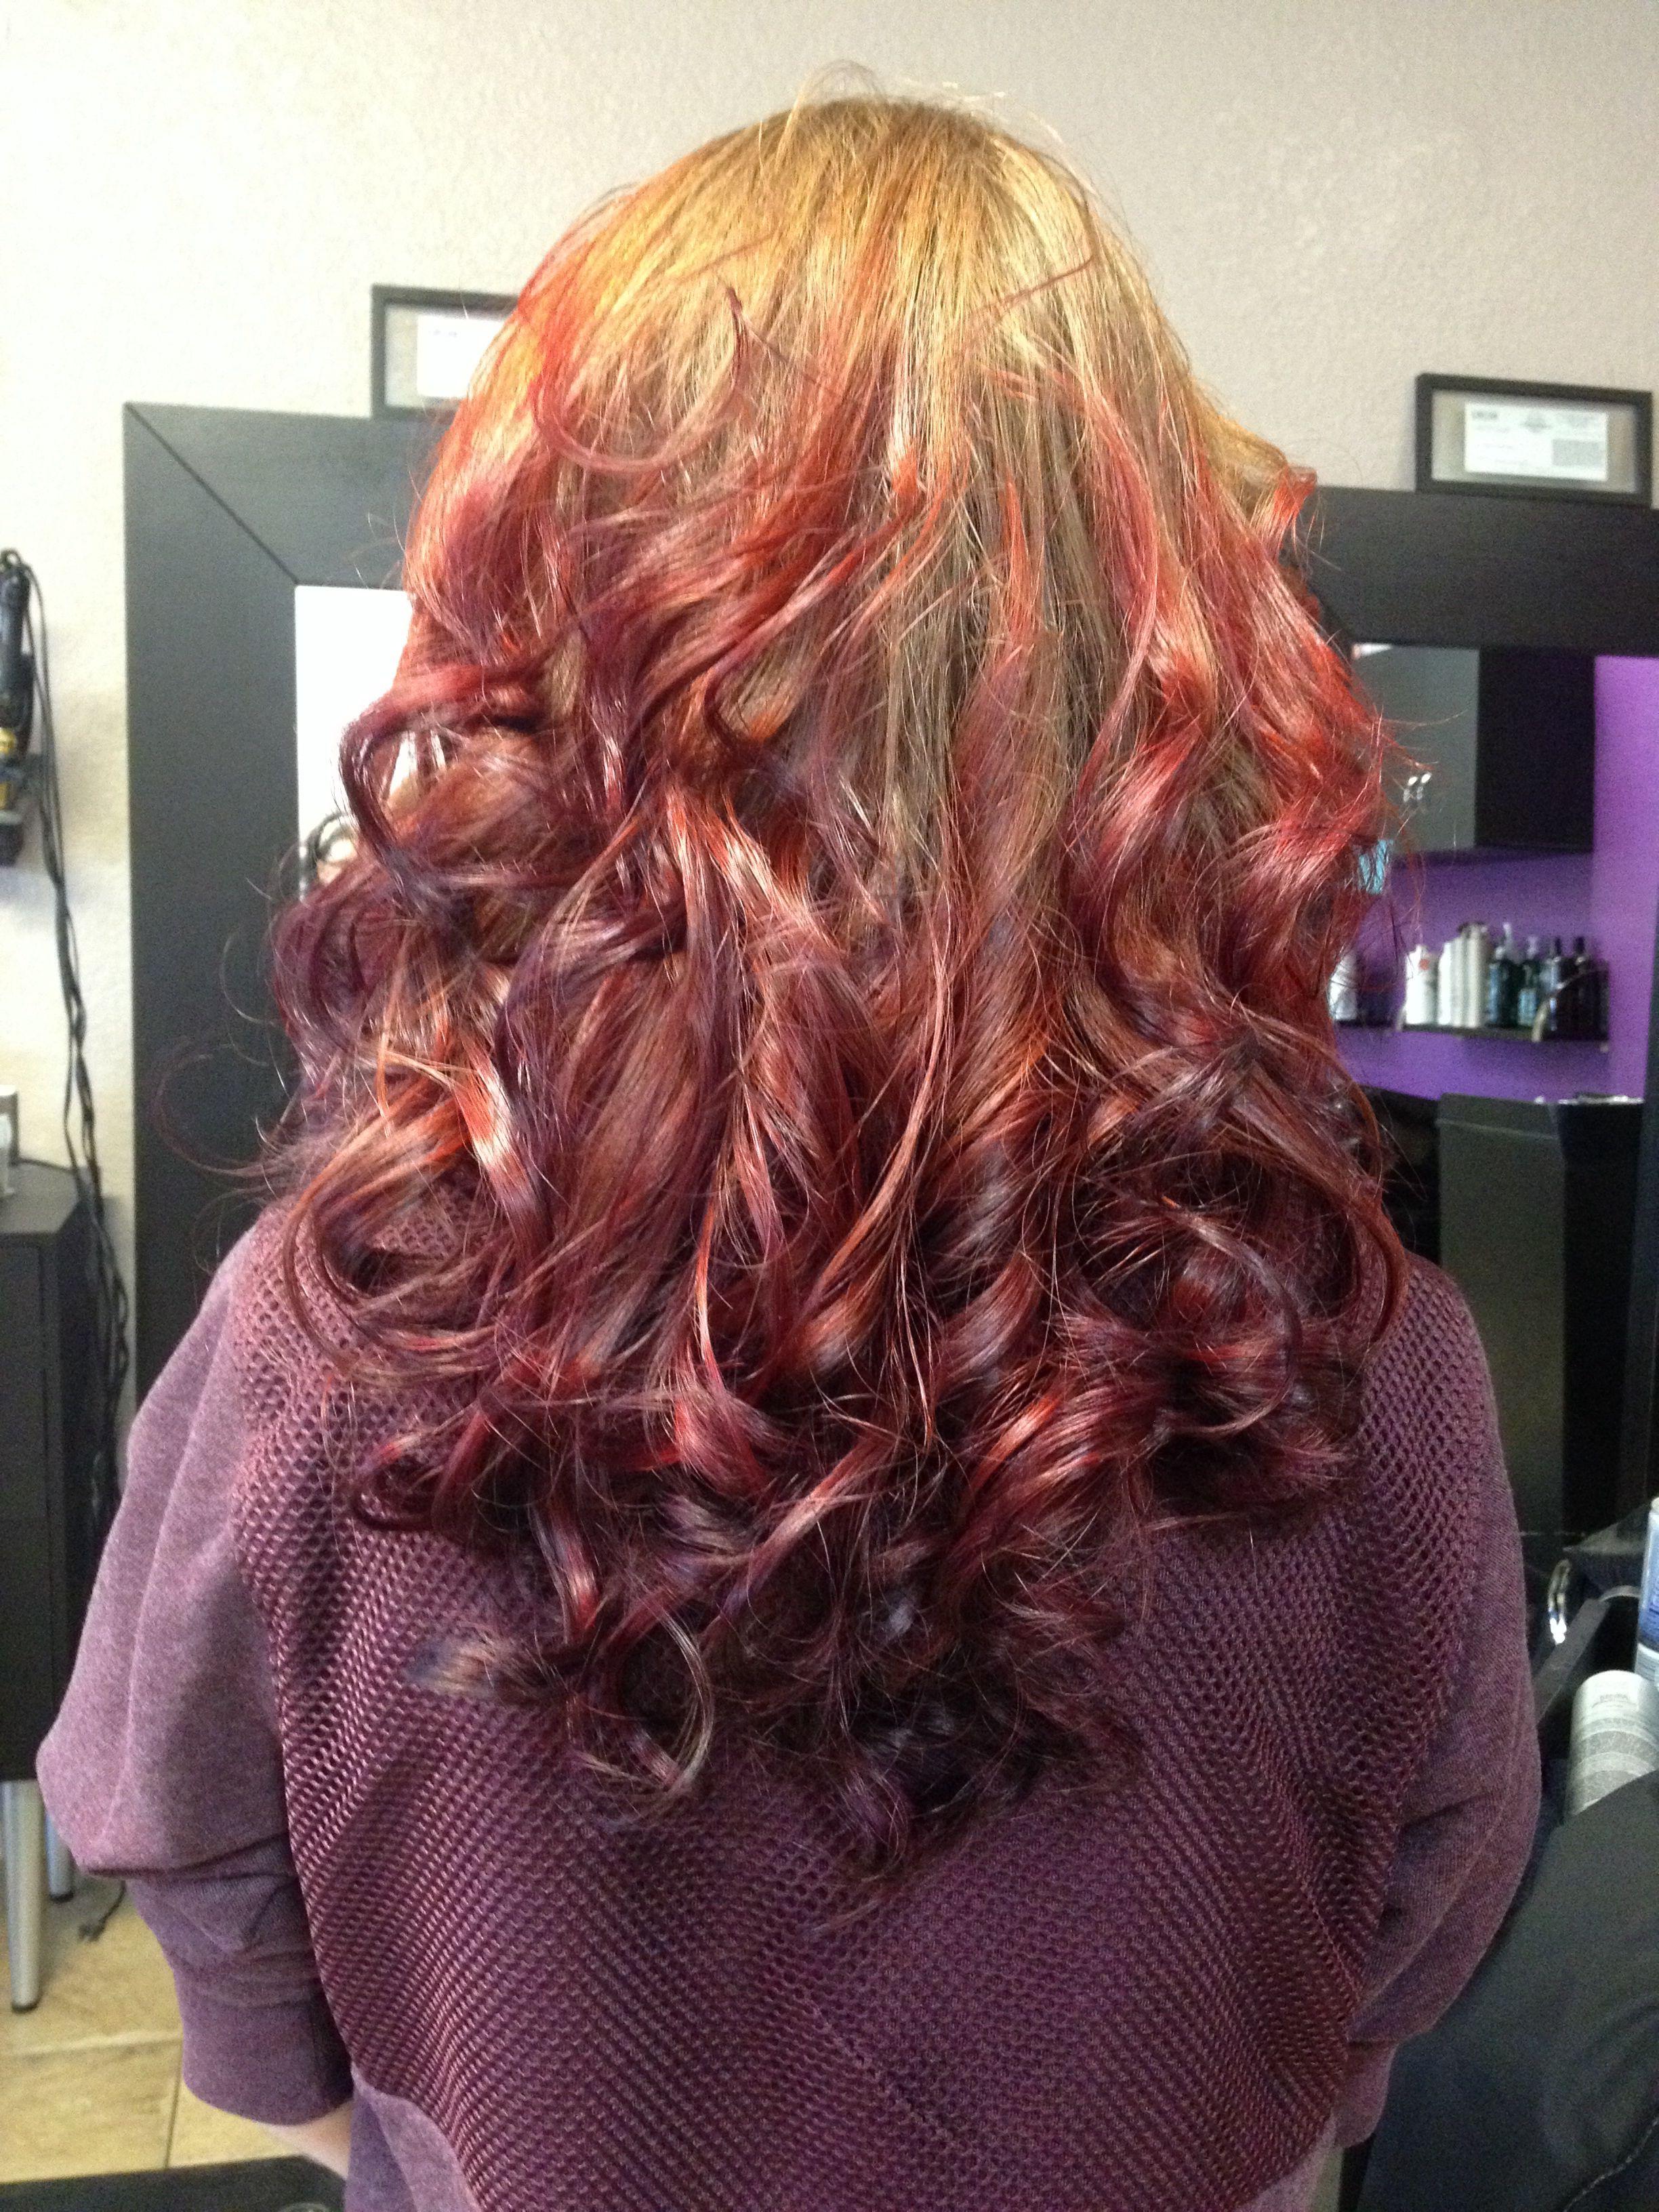 Pin By Lindsay Meyer On Hair Ideas Ombre Hair Color Natural Red Hair Hair Color Auburn